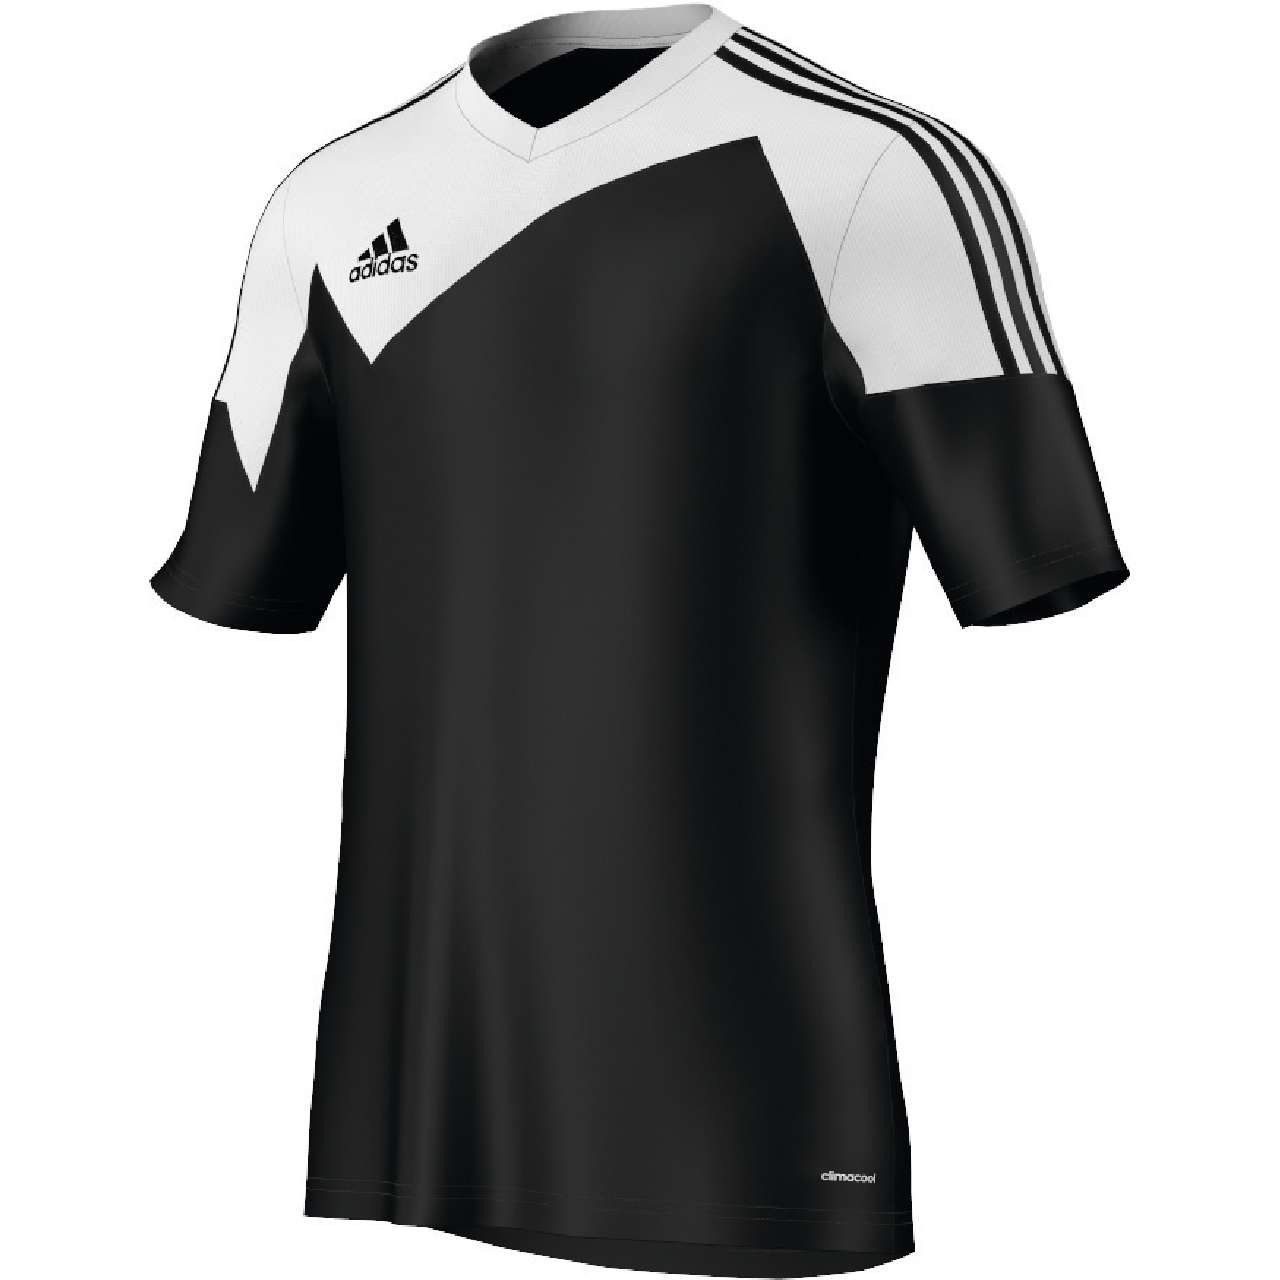 7472bb6b362 Adidas Toque 13 Jersey - Goal Kick Soccer - 5